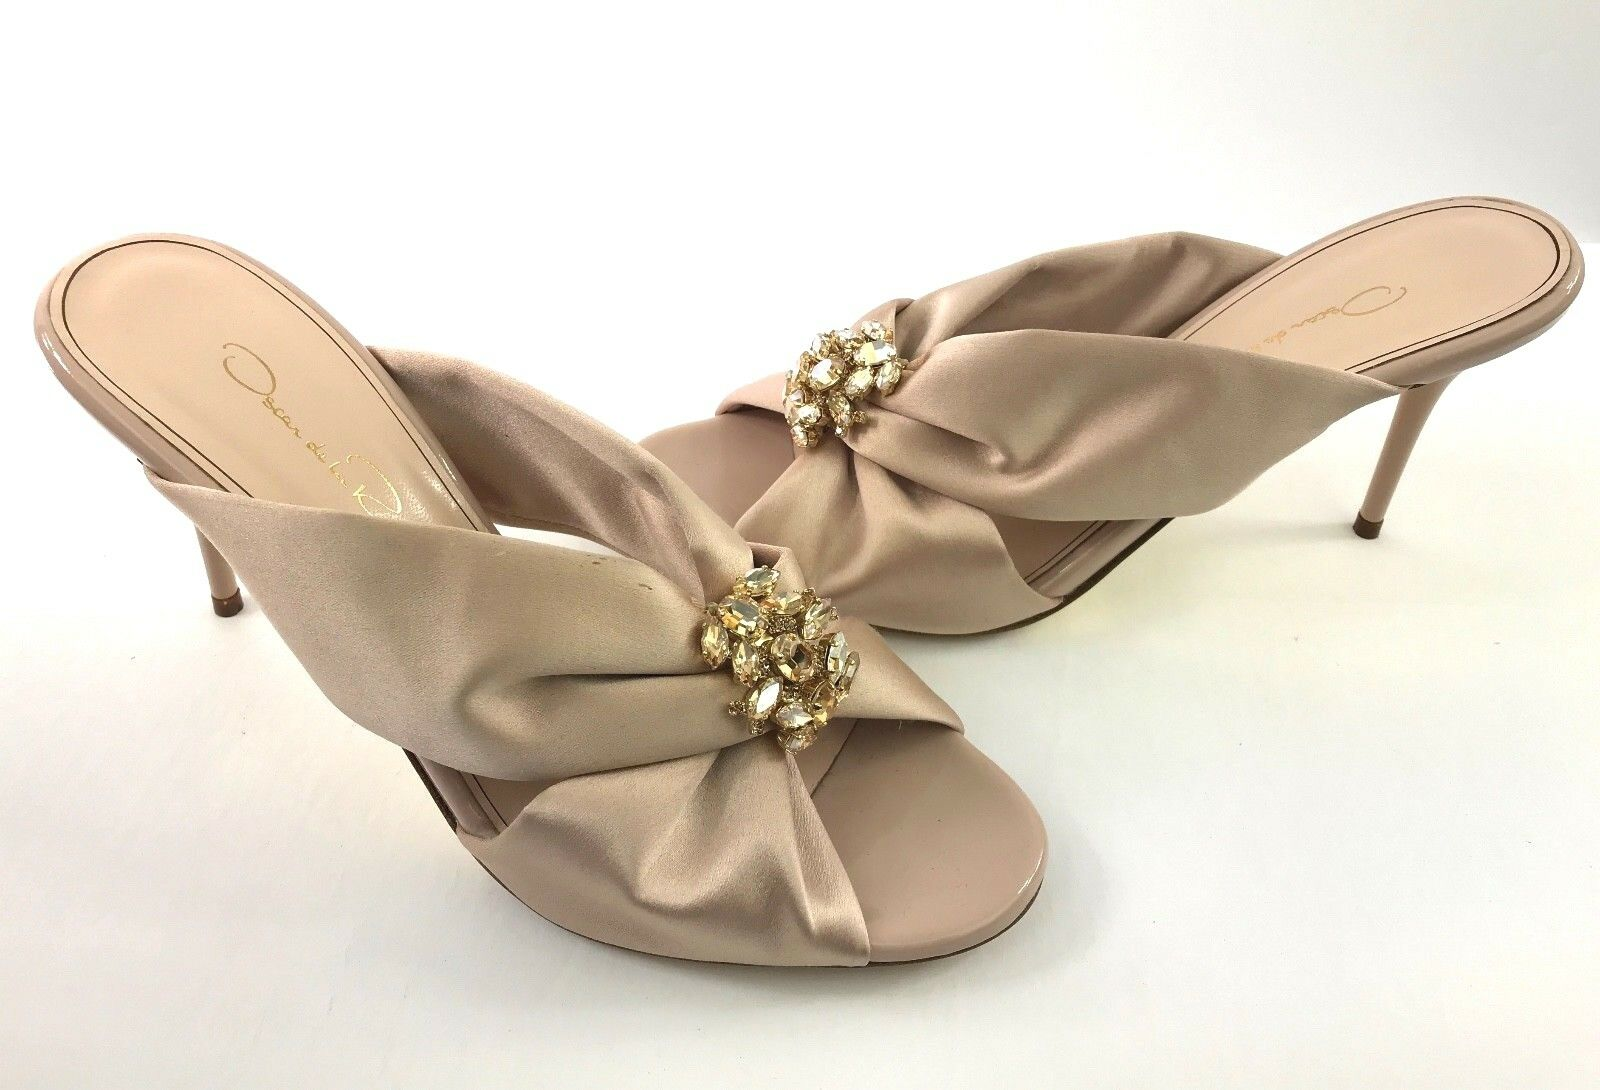 promozioni Oscar Oscar Oscar De La Renta New 'Glenn' Satin Mule Nude Beige scarpe Dimensione 36.5 US 6  alla moda